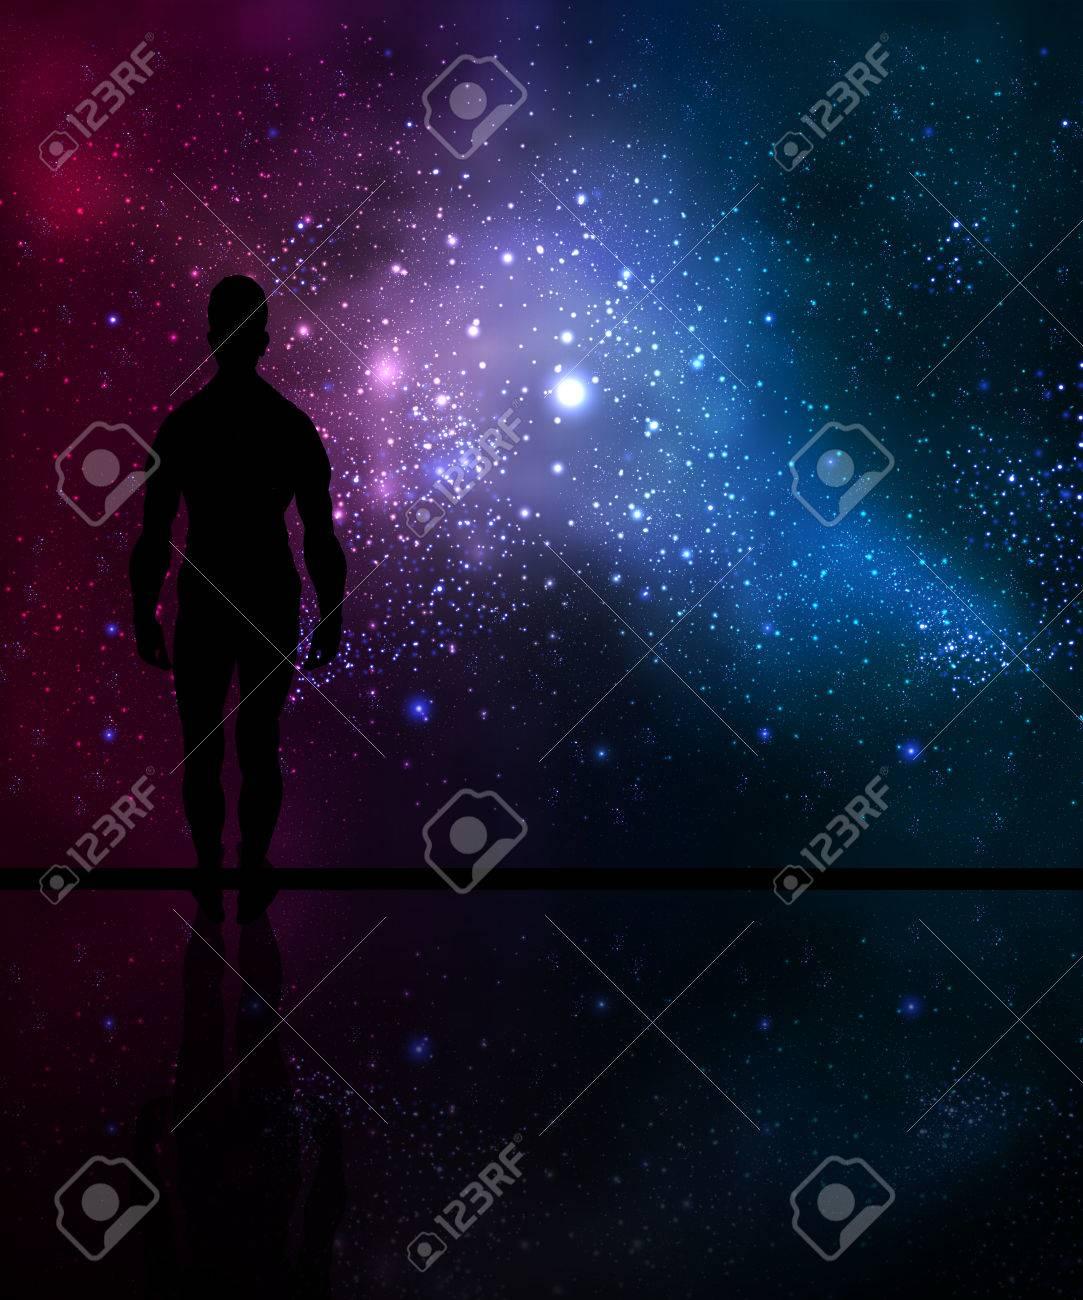 Man looks at the cosmos, vector art illustration. - 59379185